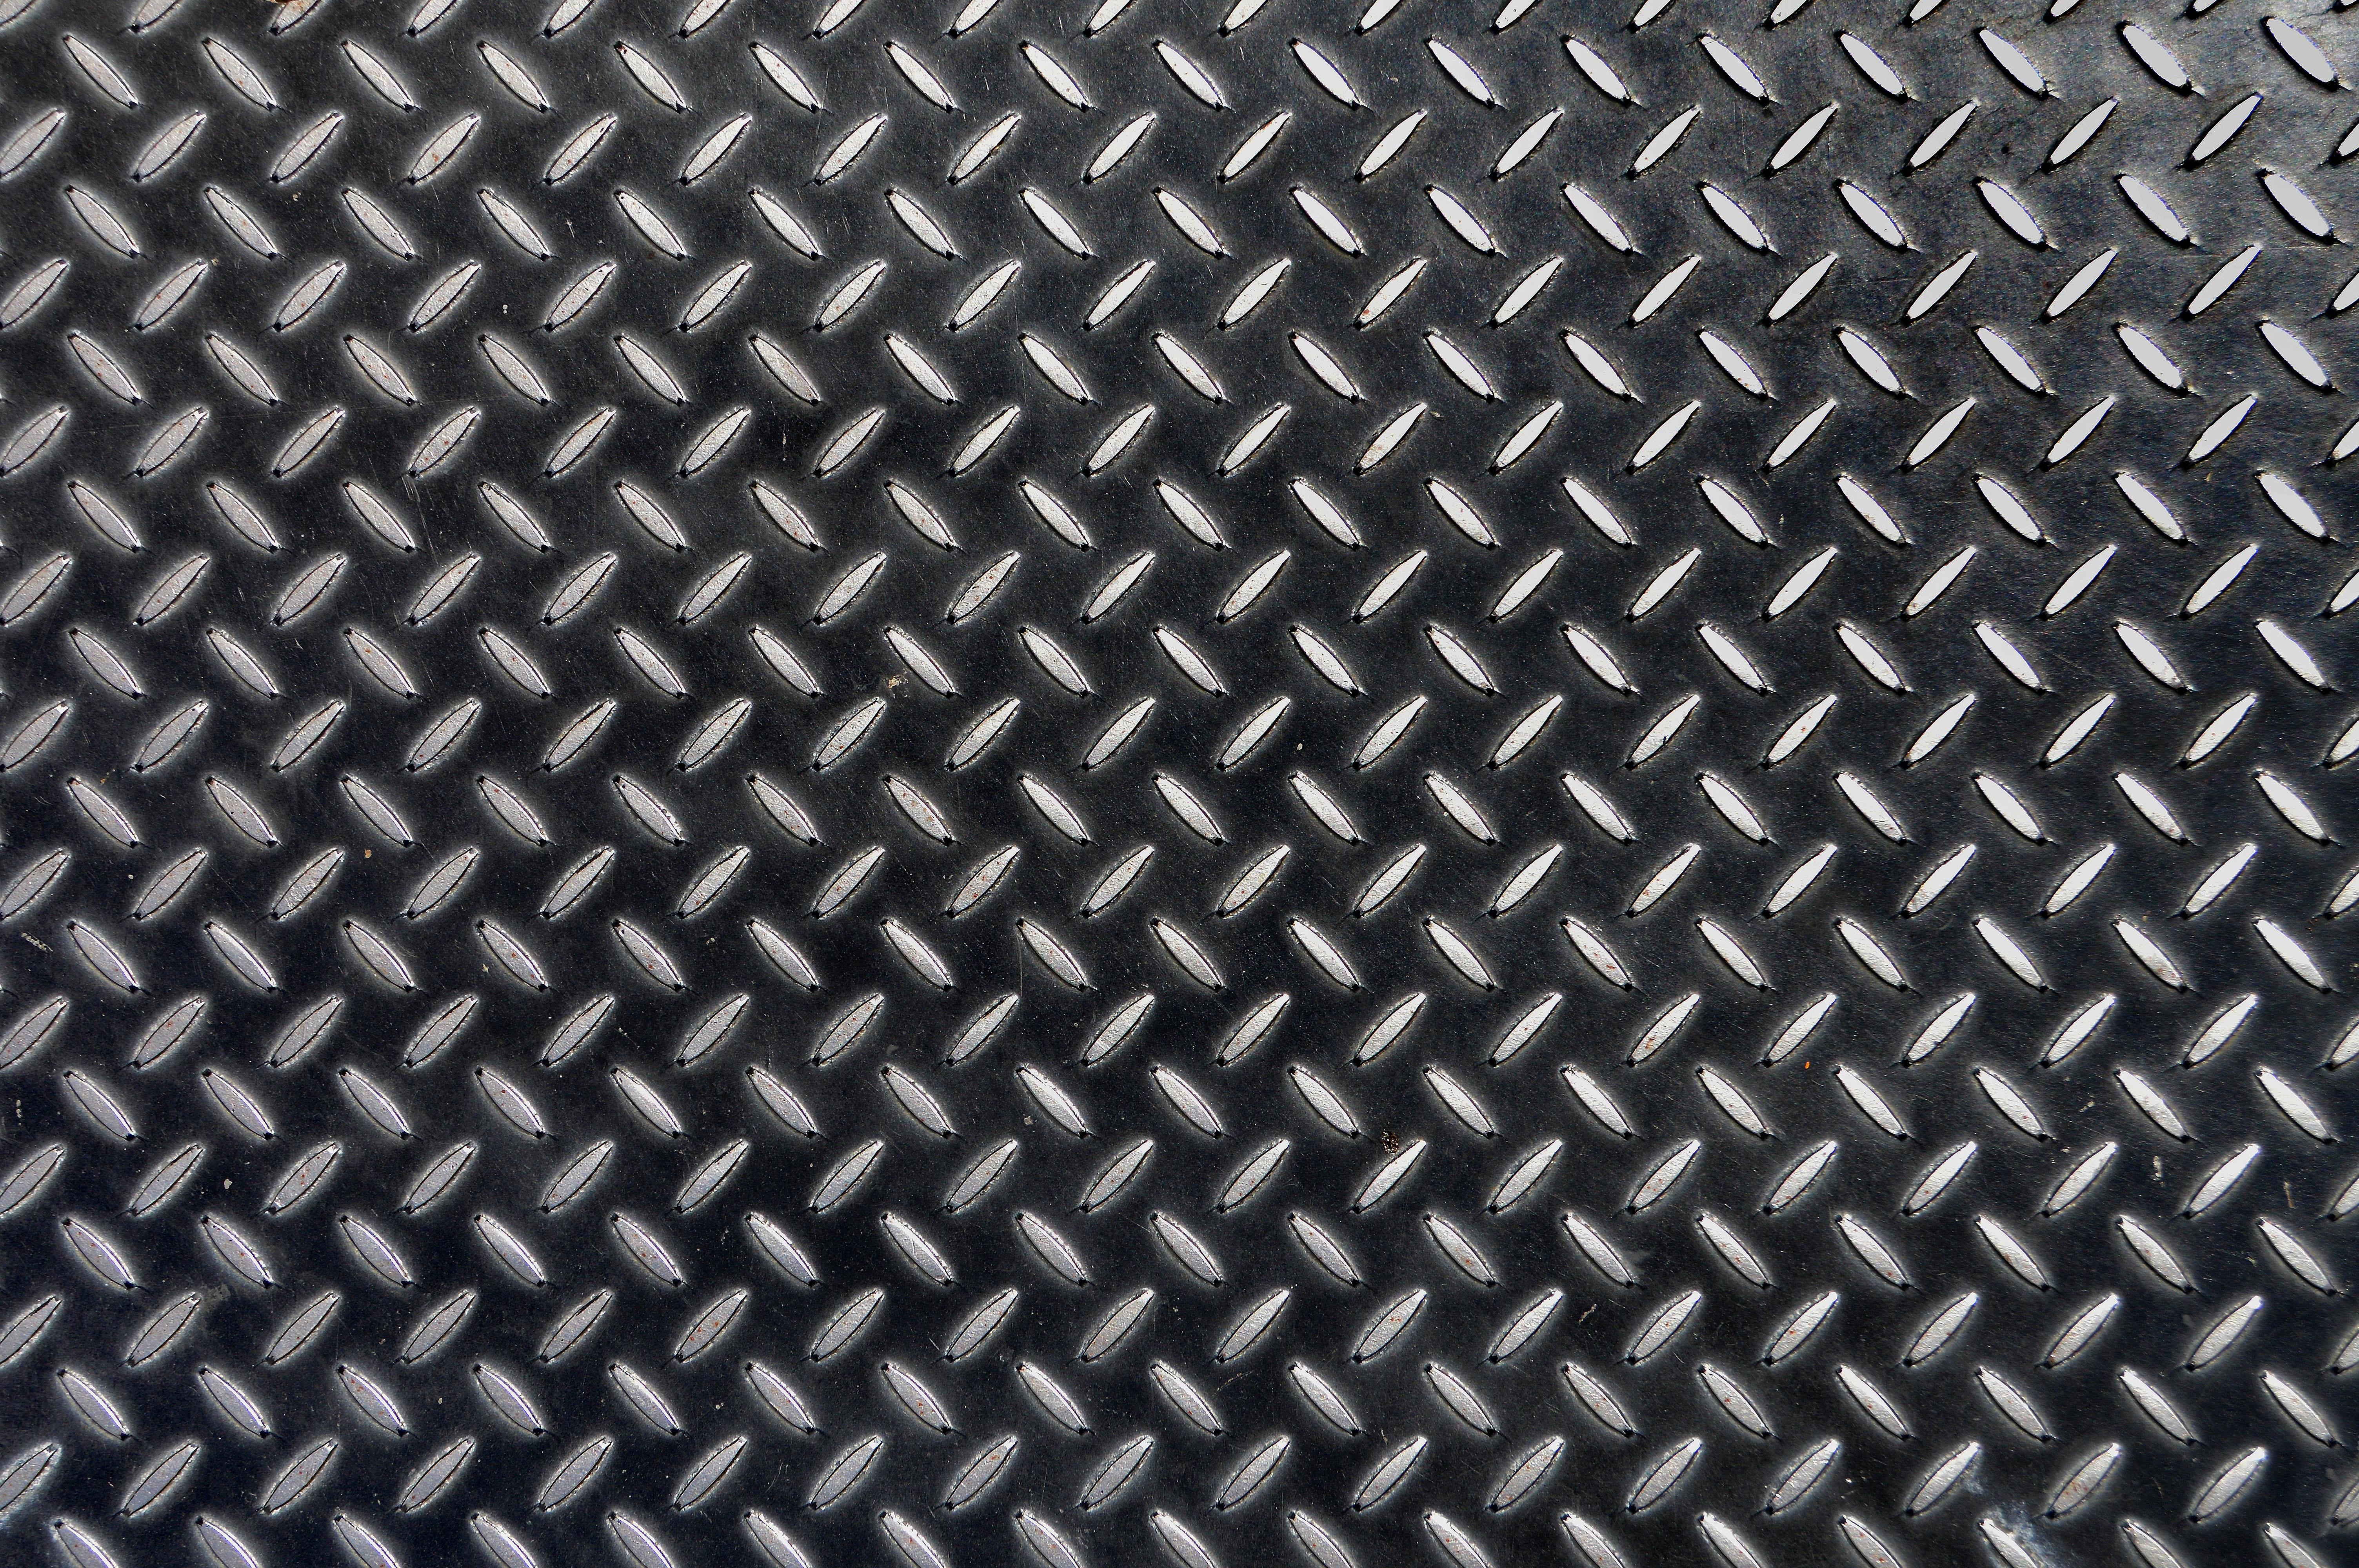 diamond plate metallic border - photo #14